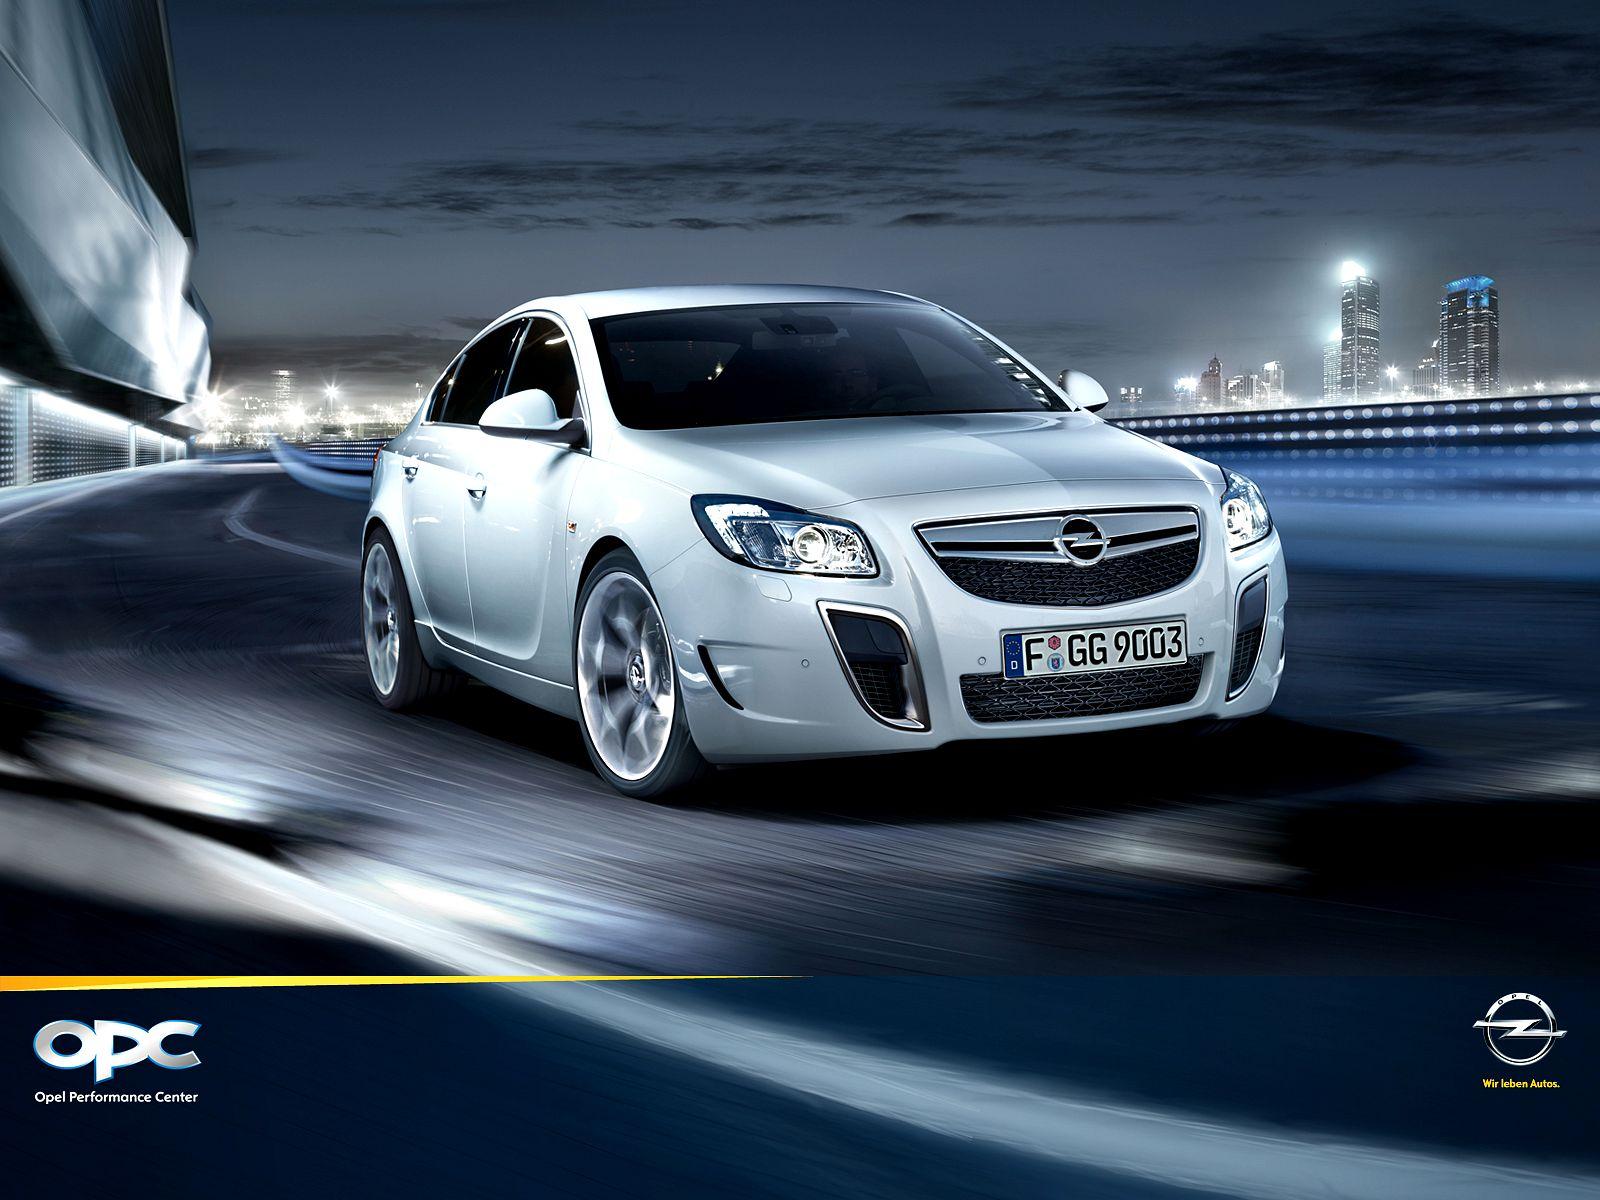 Opel Insignia Opc Wallpaper Opel Insignia Opc 1281128 Hd Wallpaper Backgrounds Download